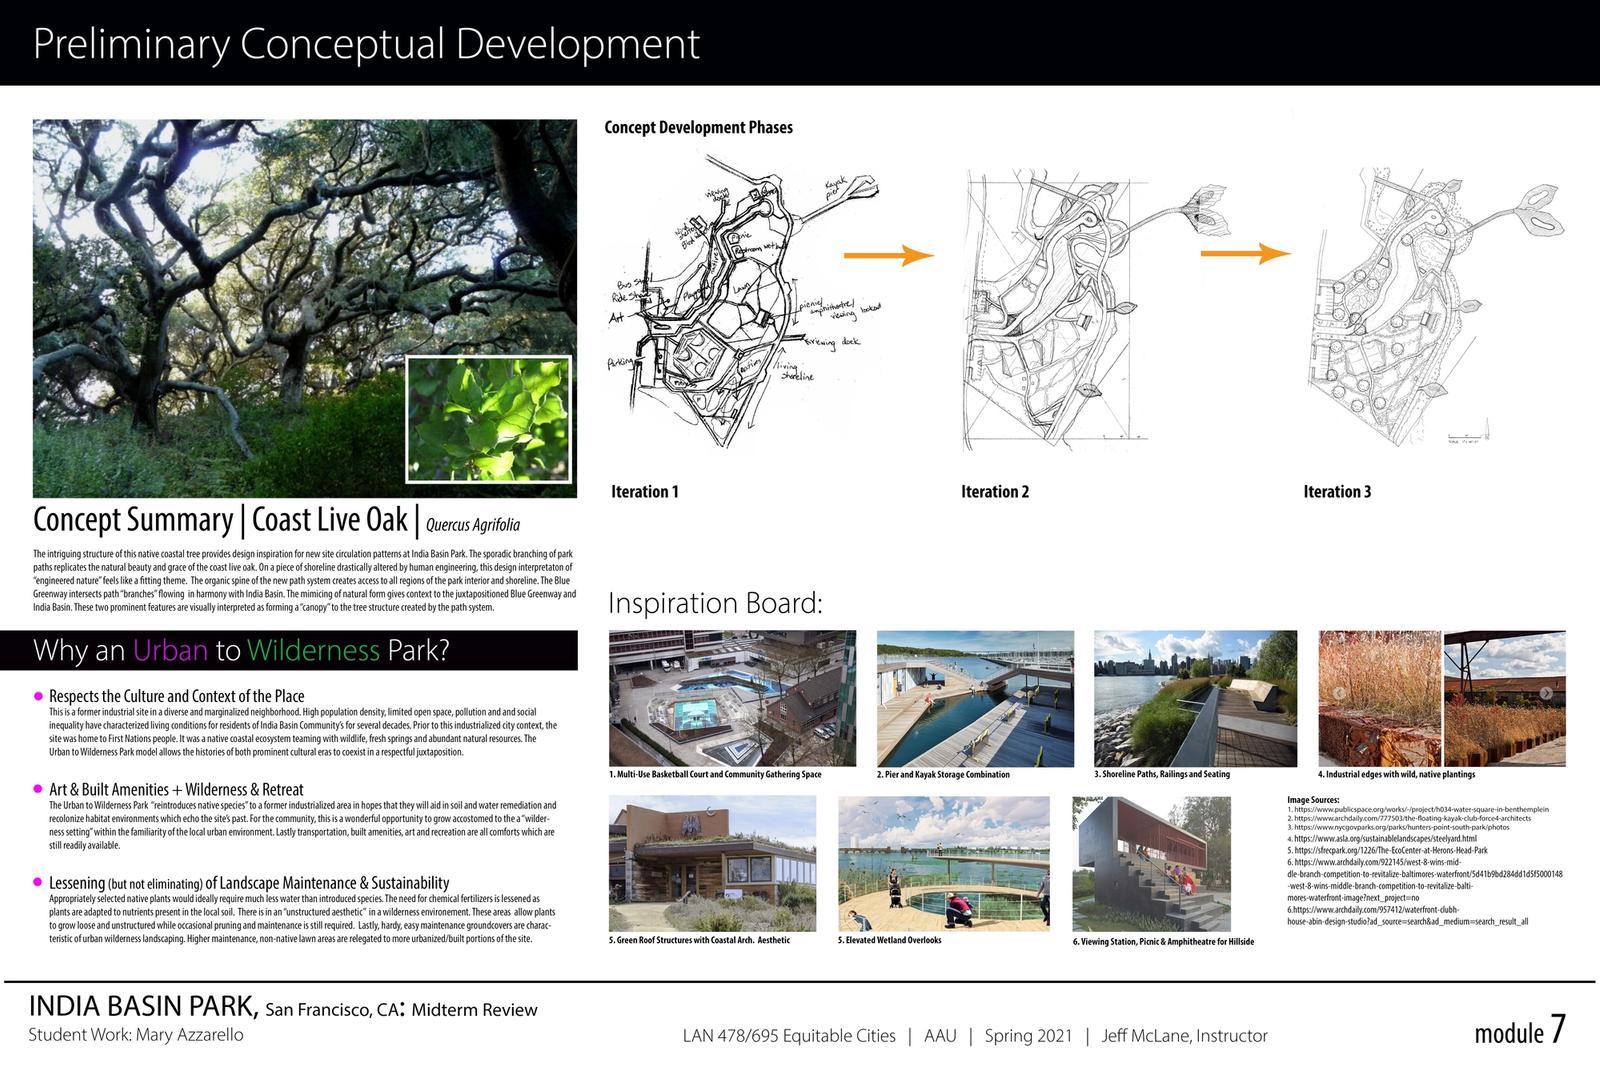 India Basin Park, San Francisco - Preliminary Conceptual Development